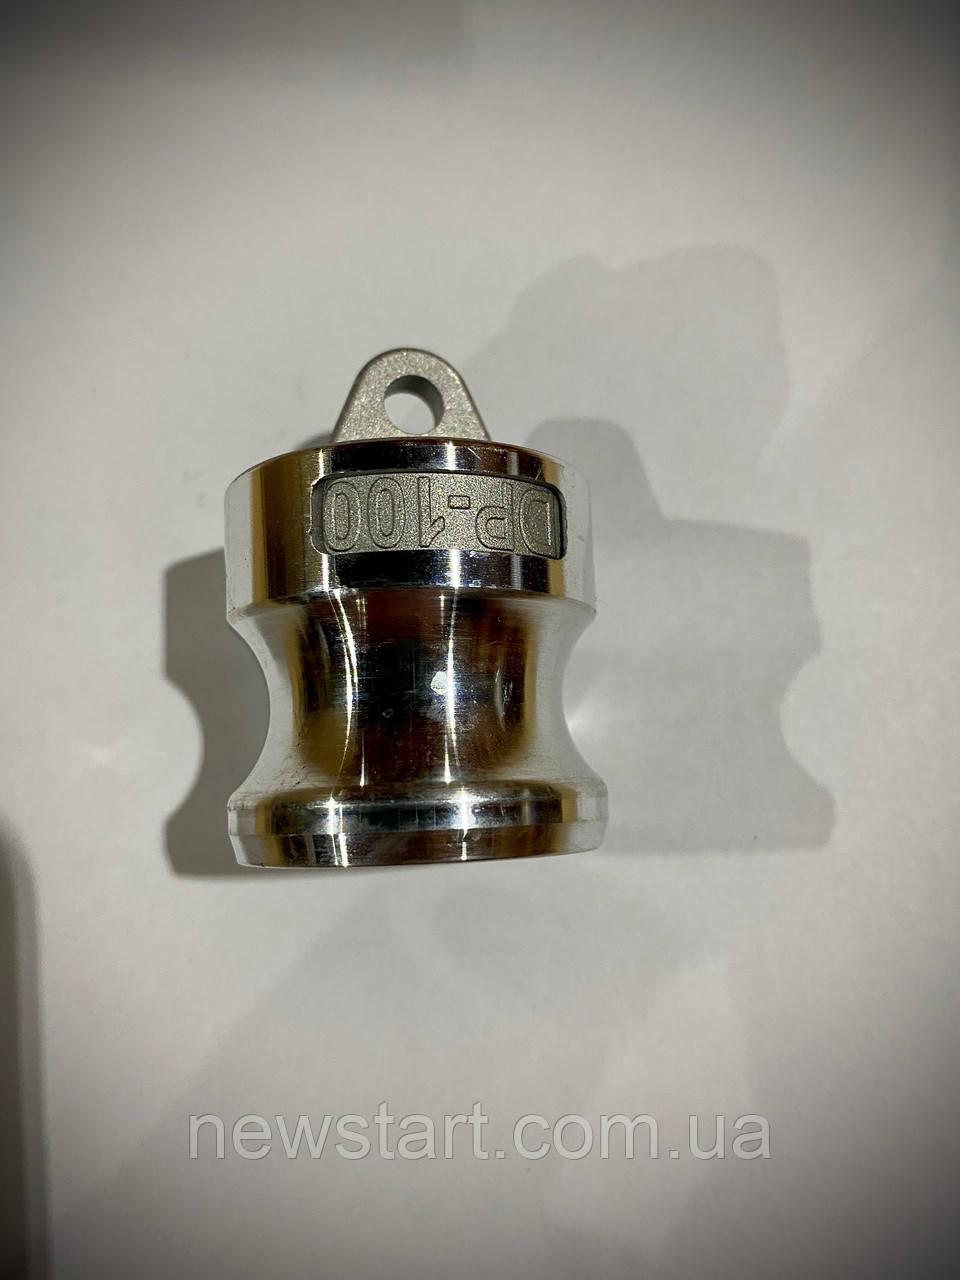 Камлок заглушка тип DP (camlock) алюминий